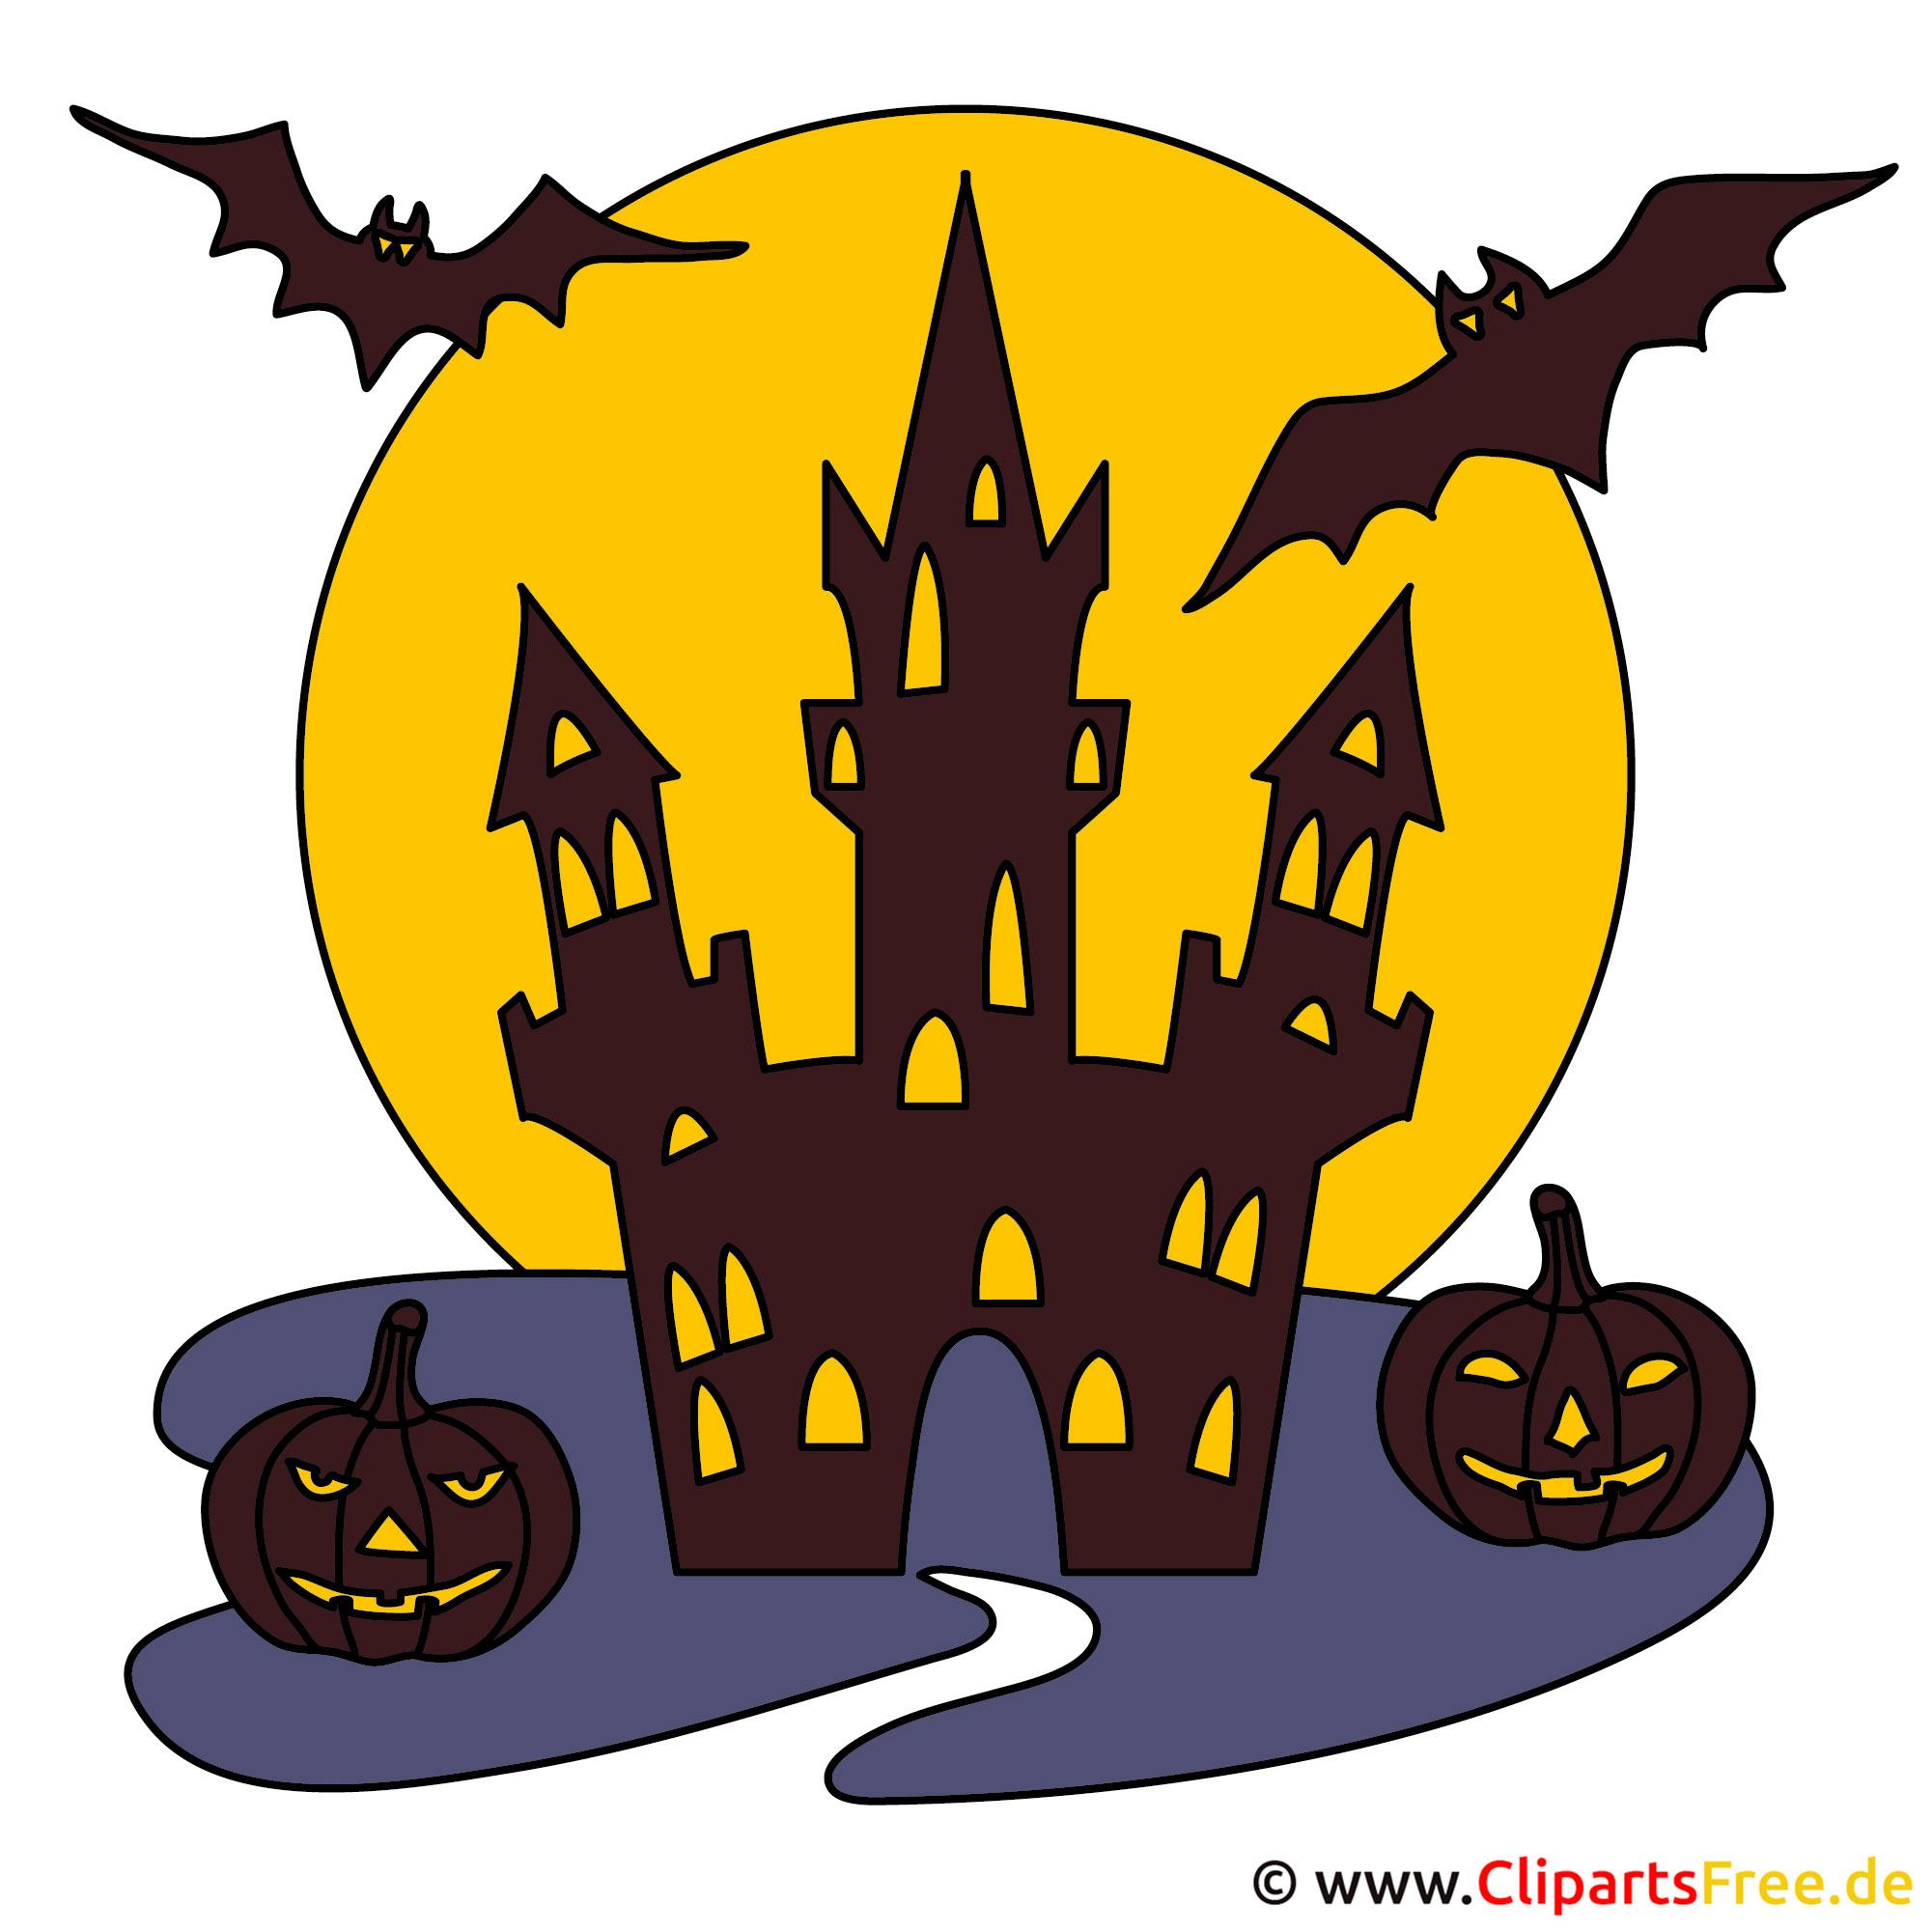 clipart halloween hexen - photo #17